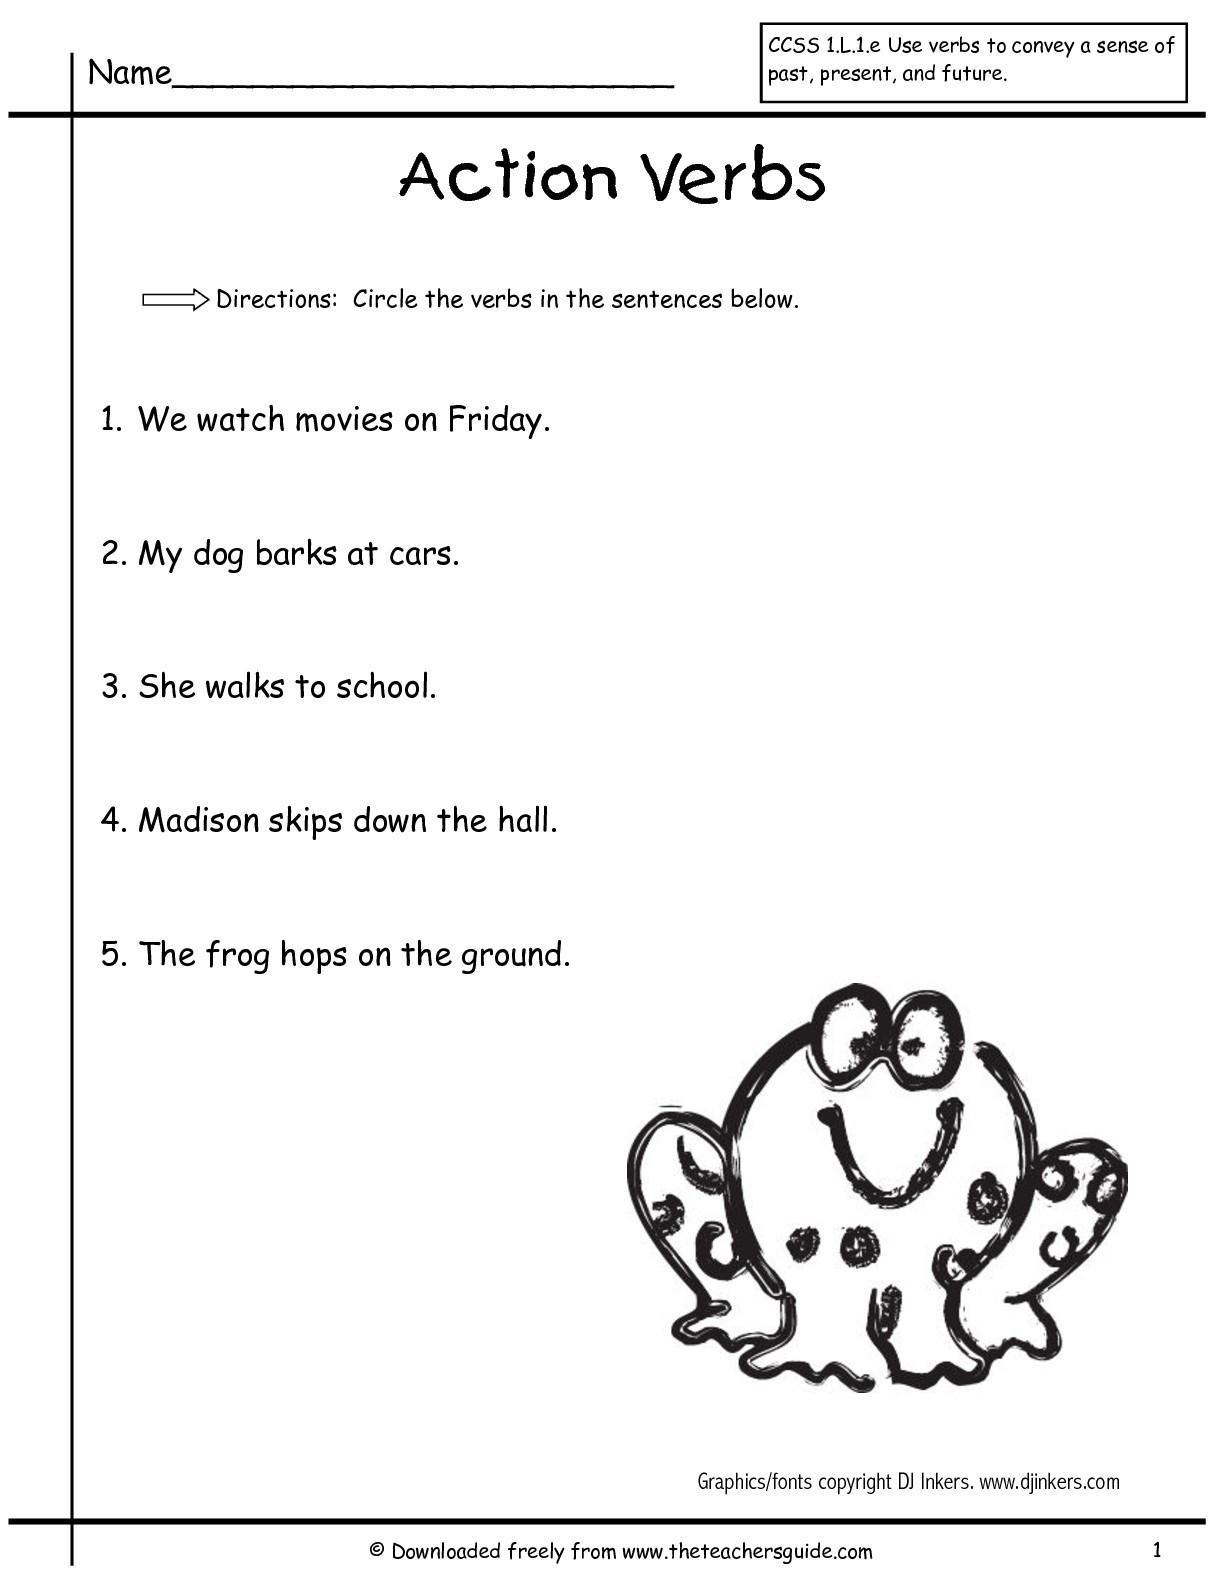 Action Verb Worksheets For Grade 1